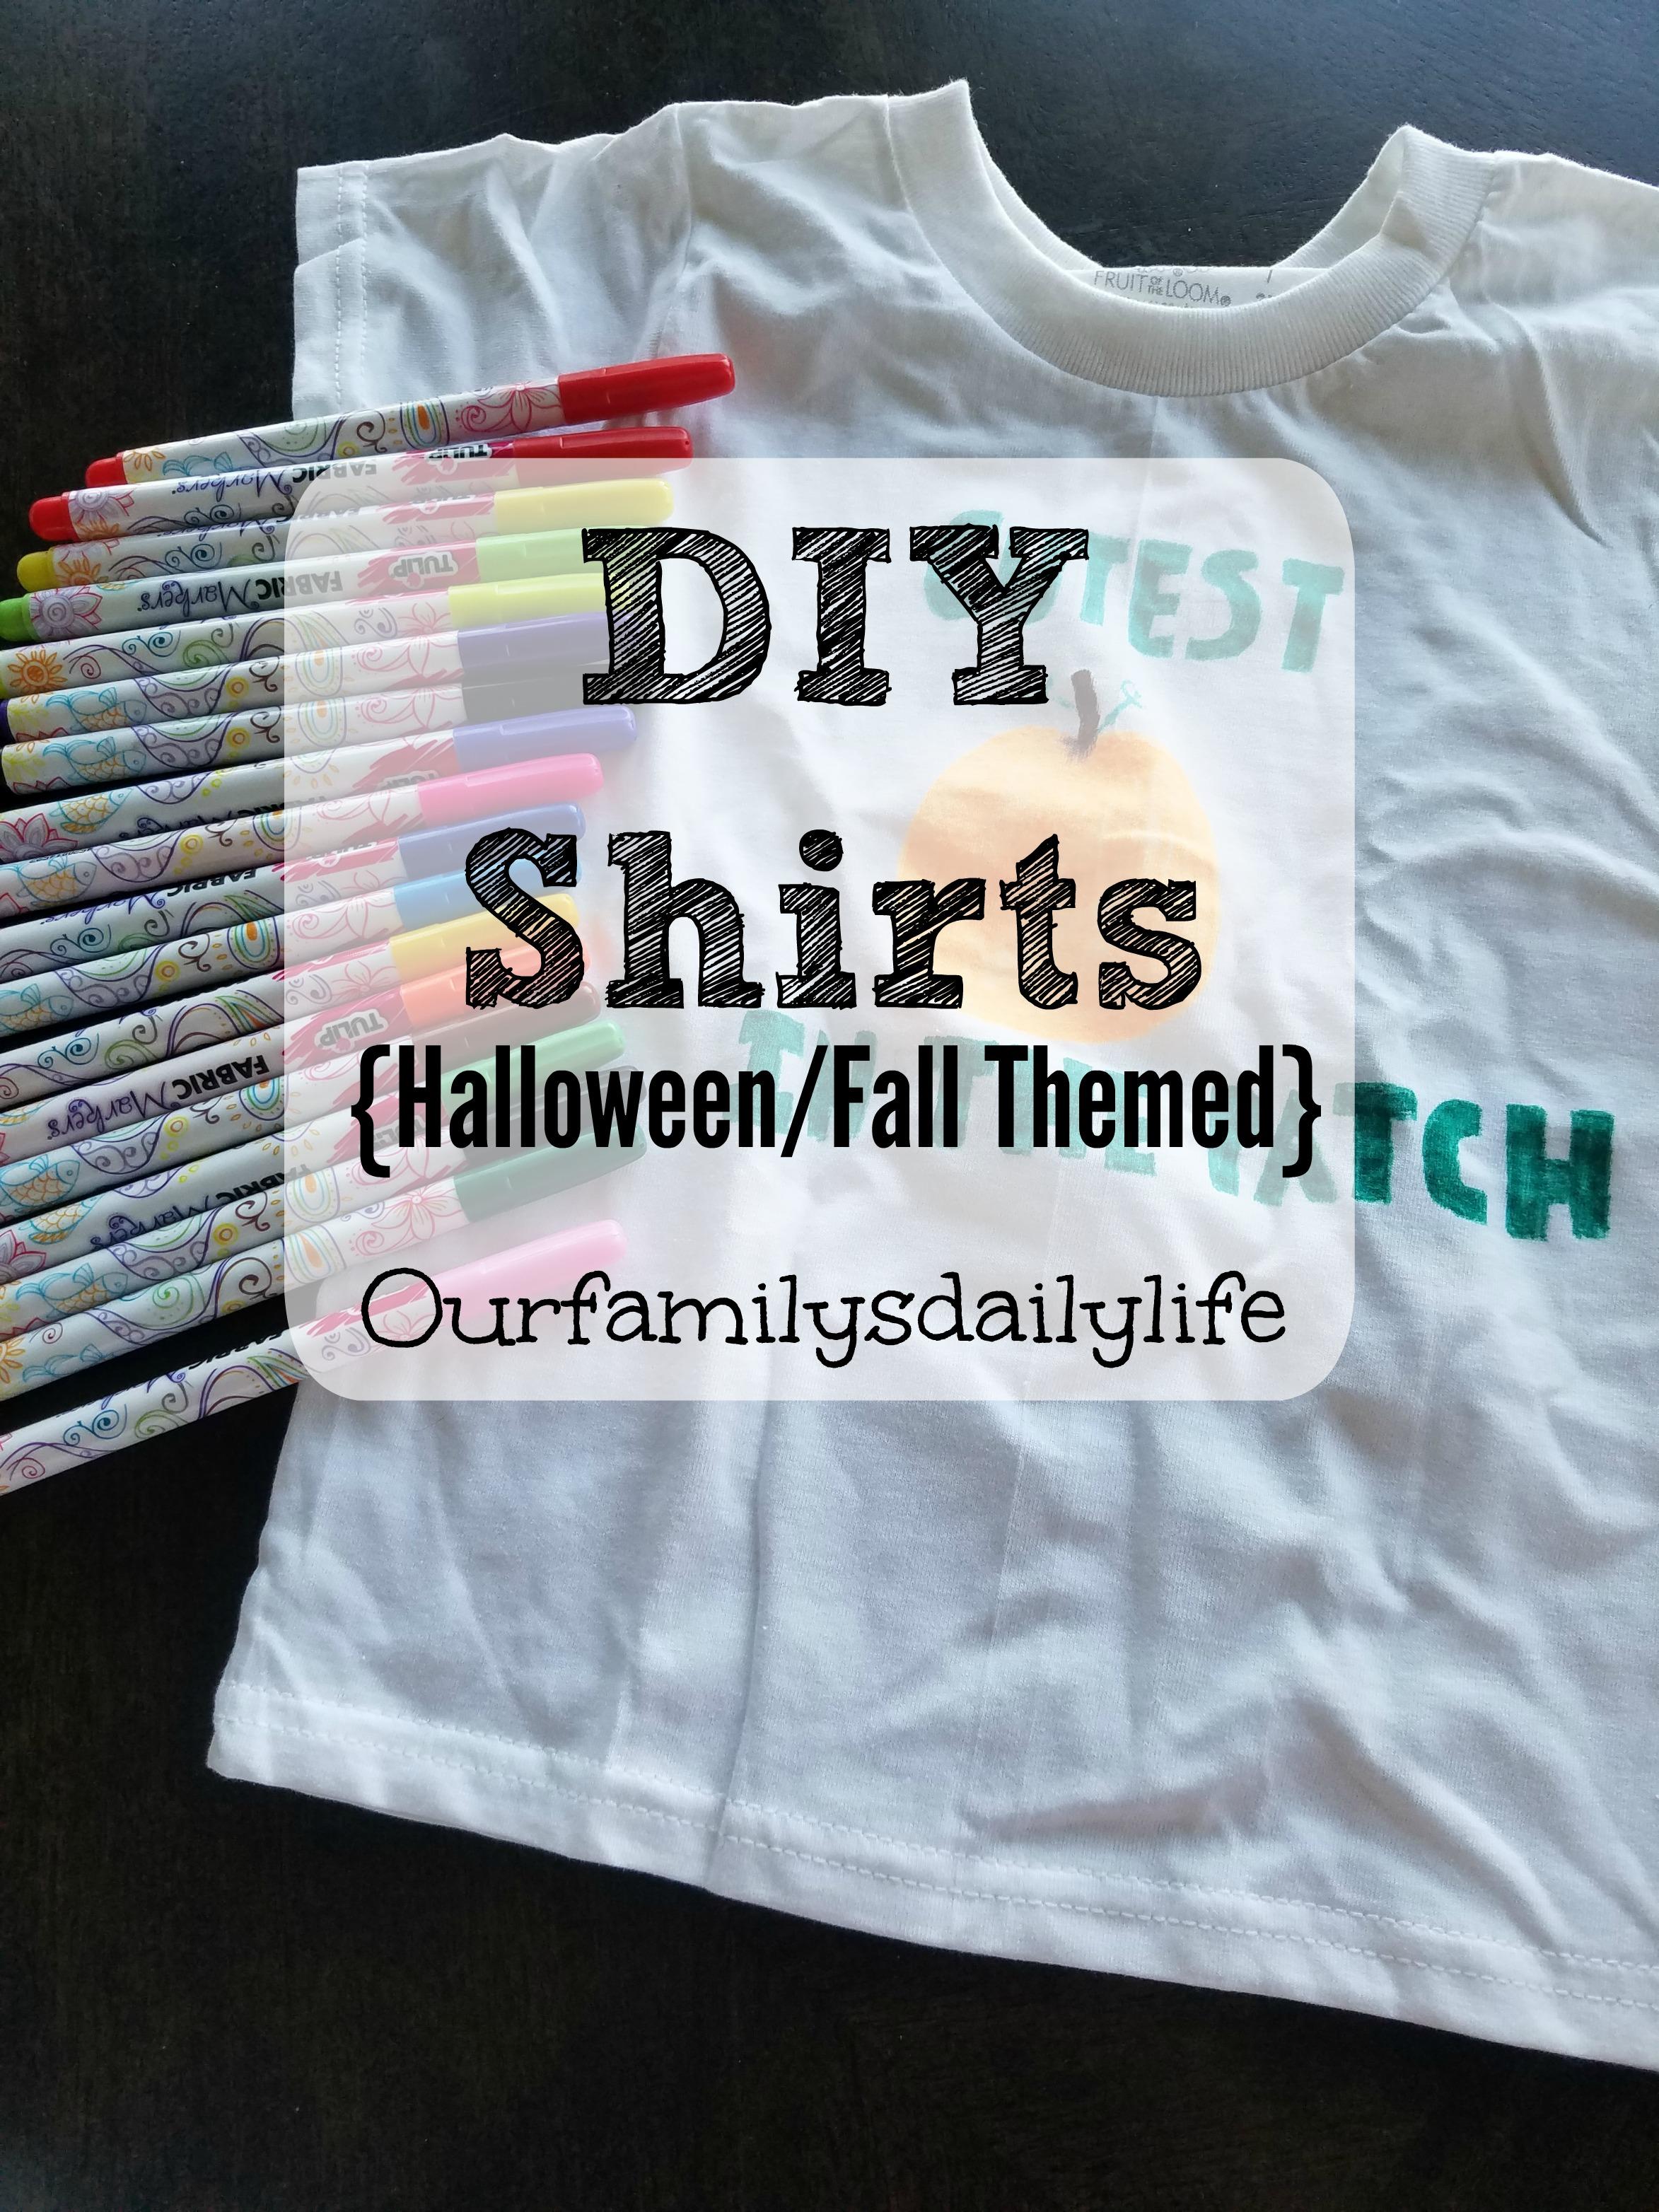 diy shirts halloween fall